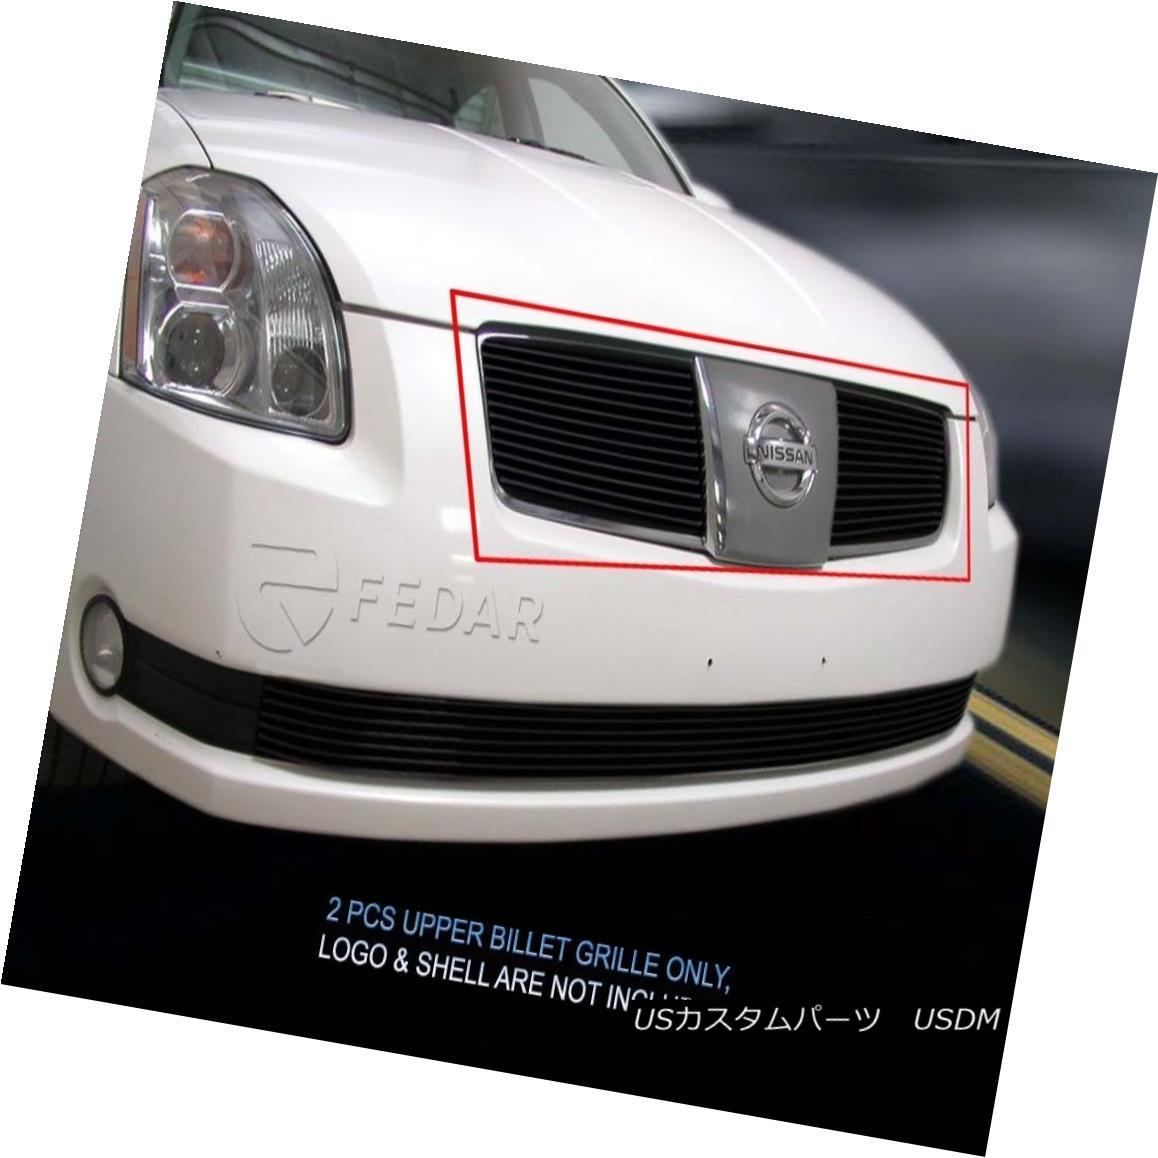 Maxima Grille Upper Nissan Black Billet Insert 2 Fedar Pcs 04-06 フィット04-06日産マキシマブラックビレットグリルグリルアッパーインサート2個入りFedar Fits グリル Grill